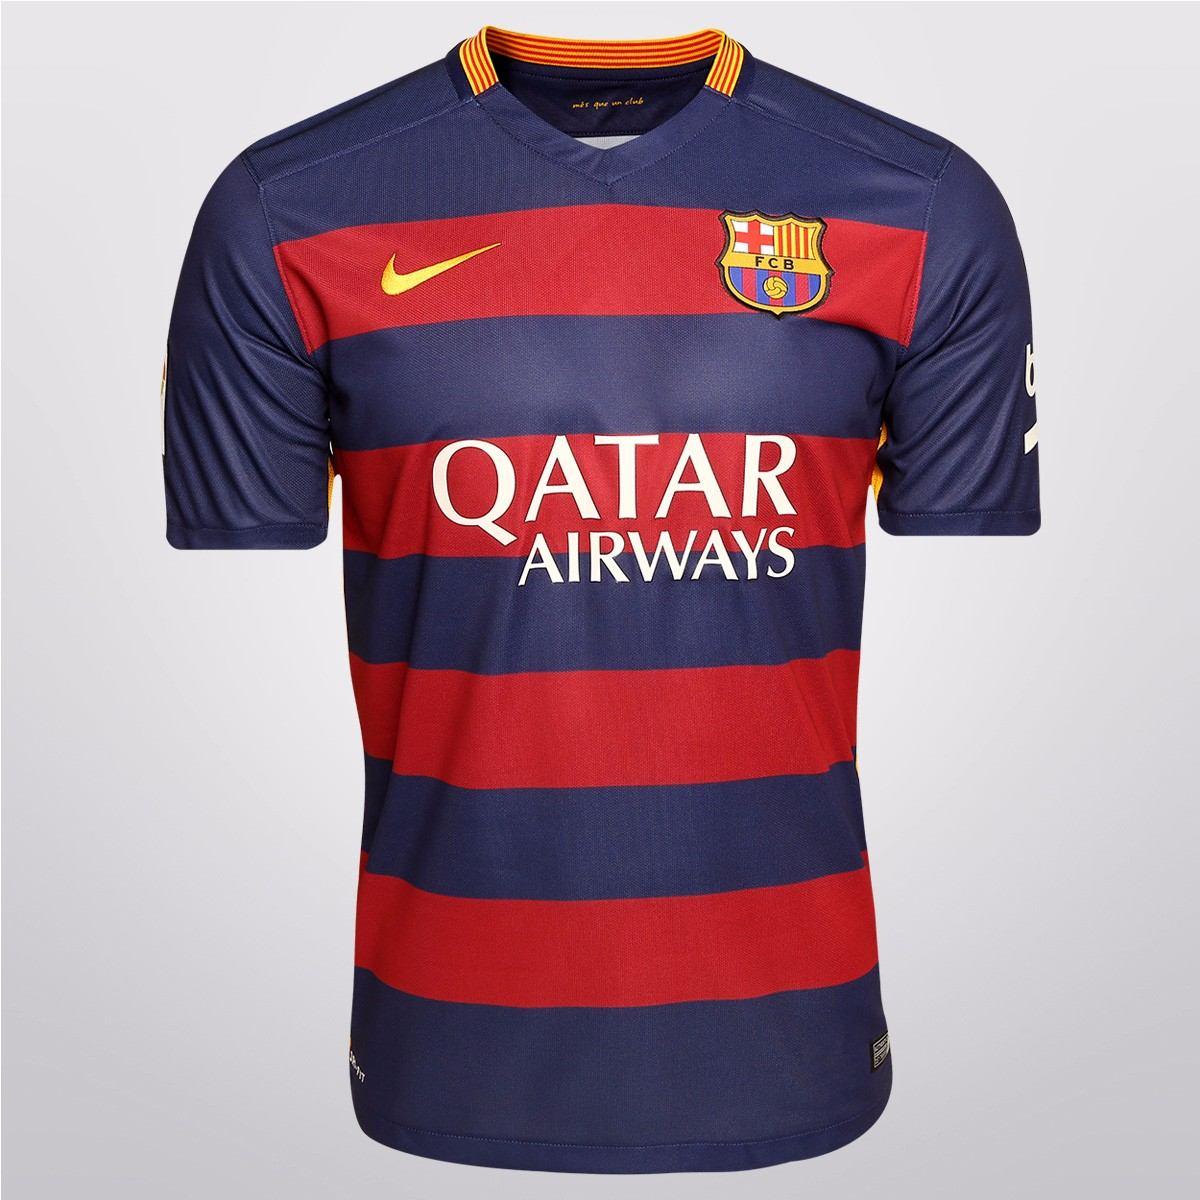 Camisa Barcelona Nike Infantil 2015 16 Home E Away - R  119 6c9aaa8f1c1f7